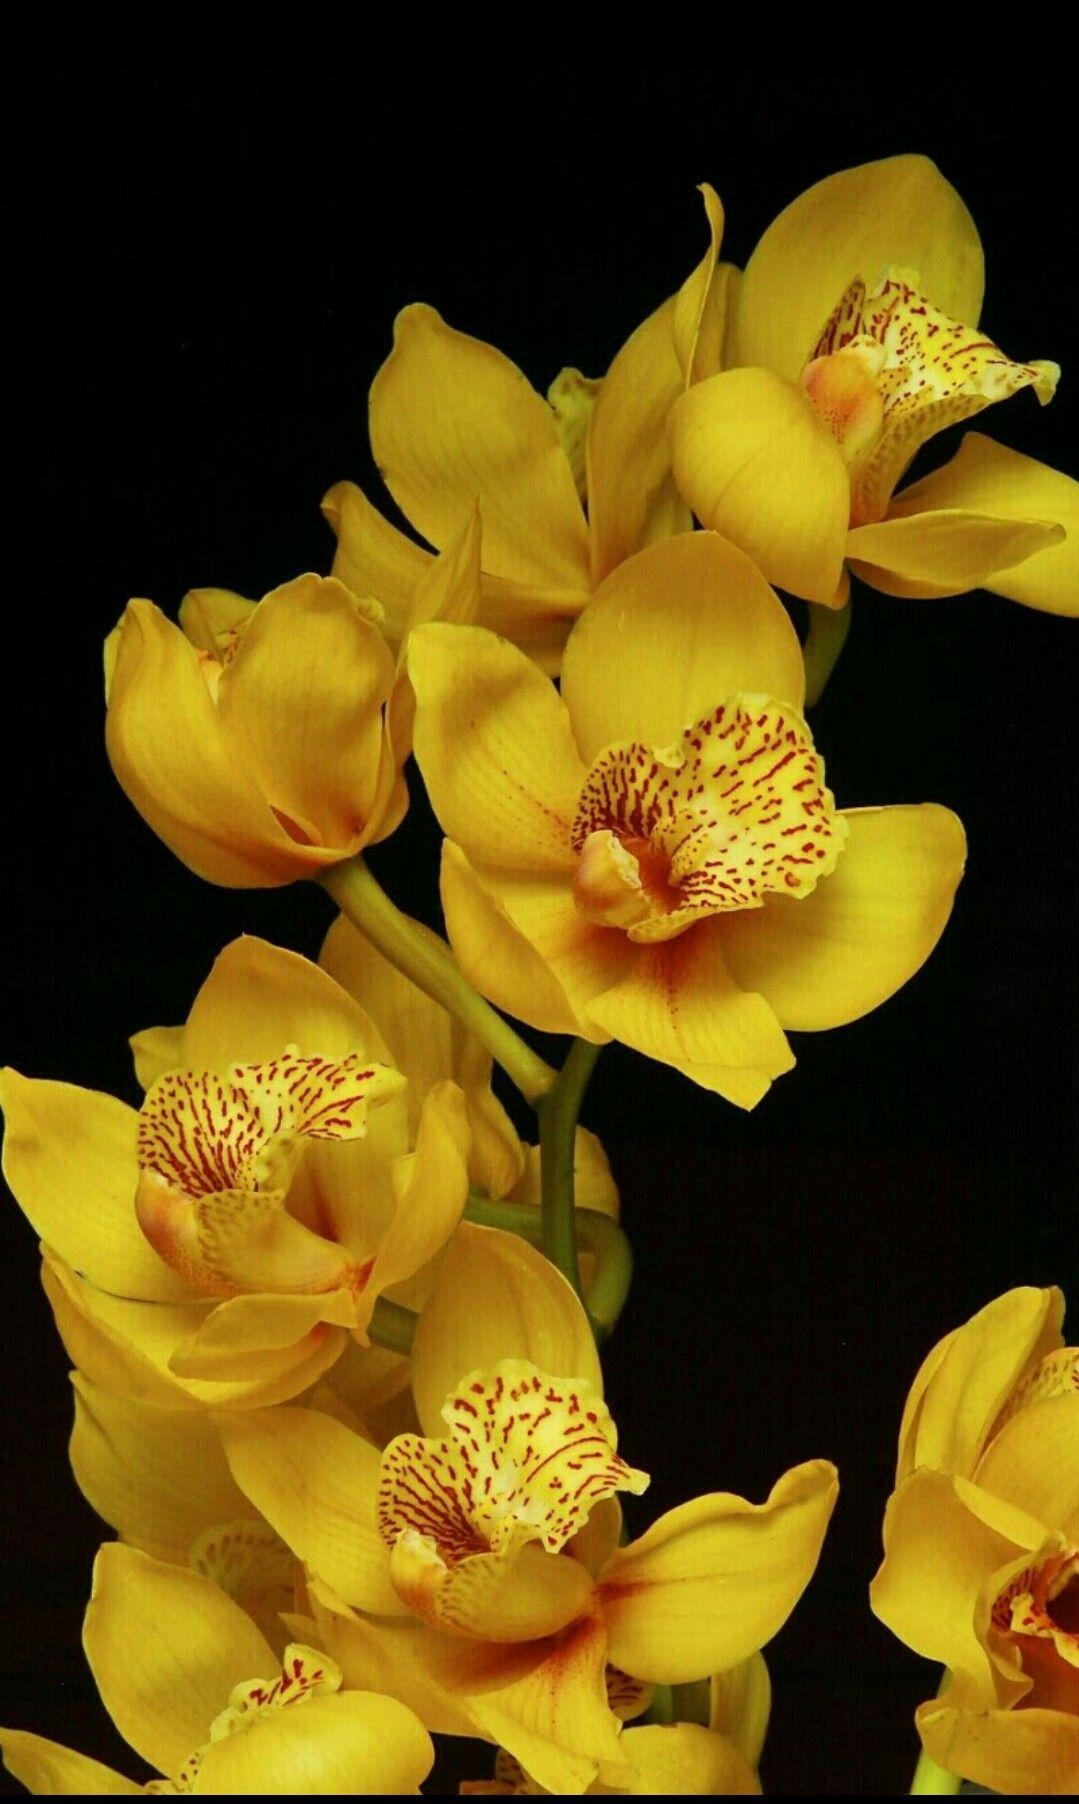 Pin von Teoflo Teodoriu auf orchidee | Pinterest